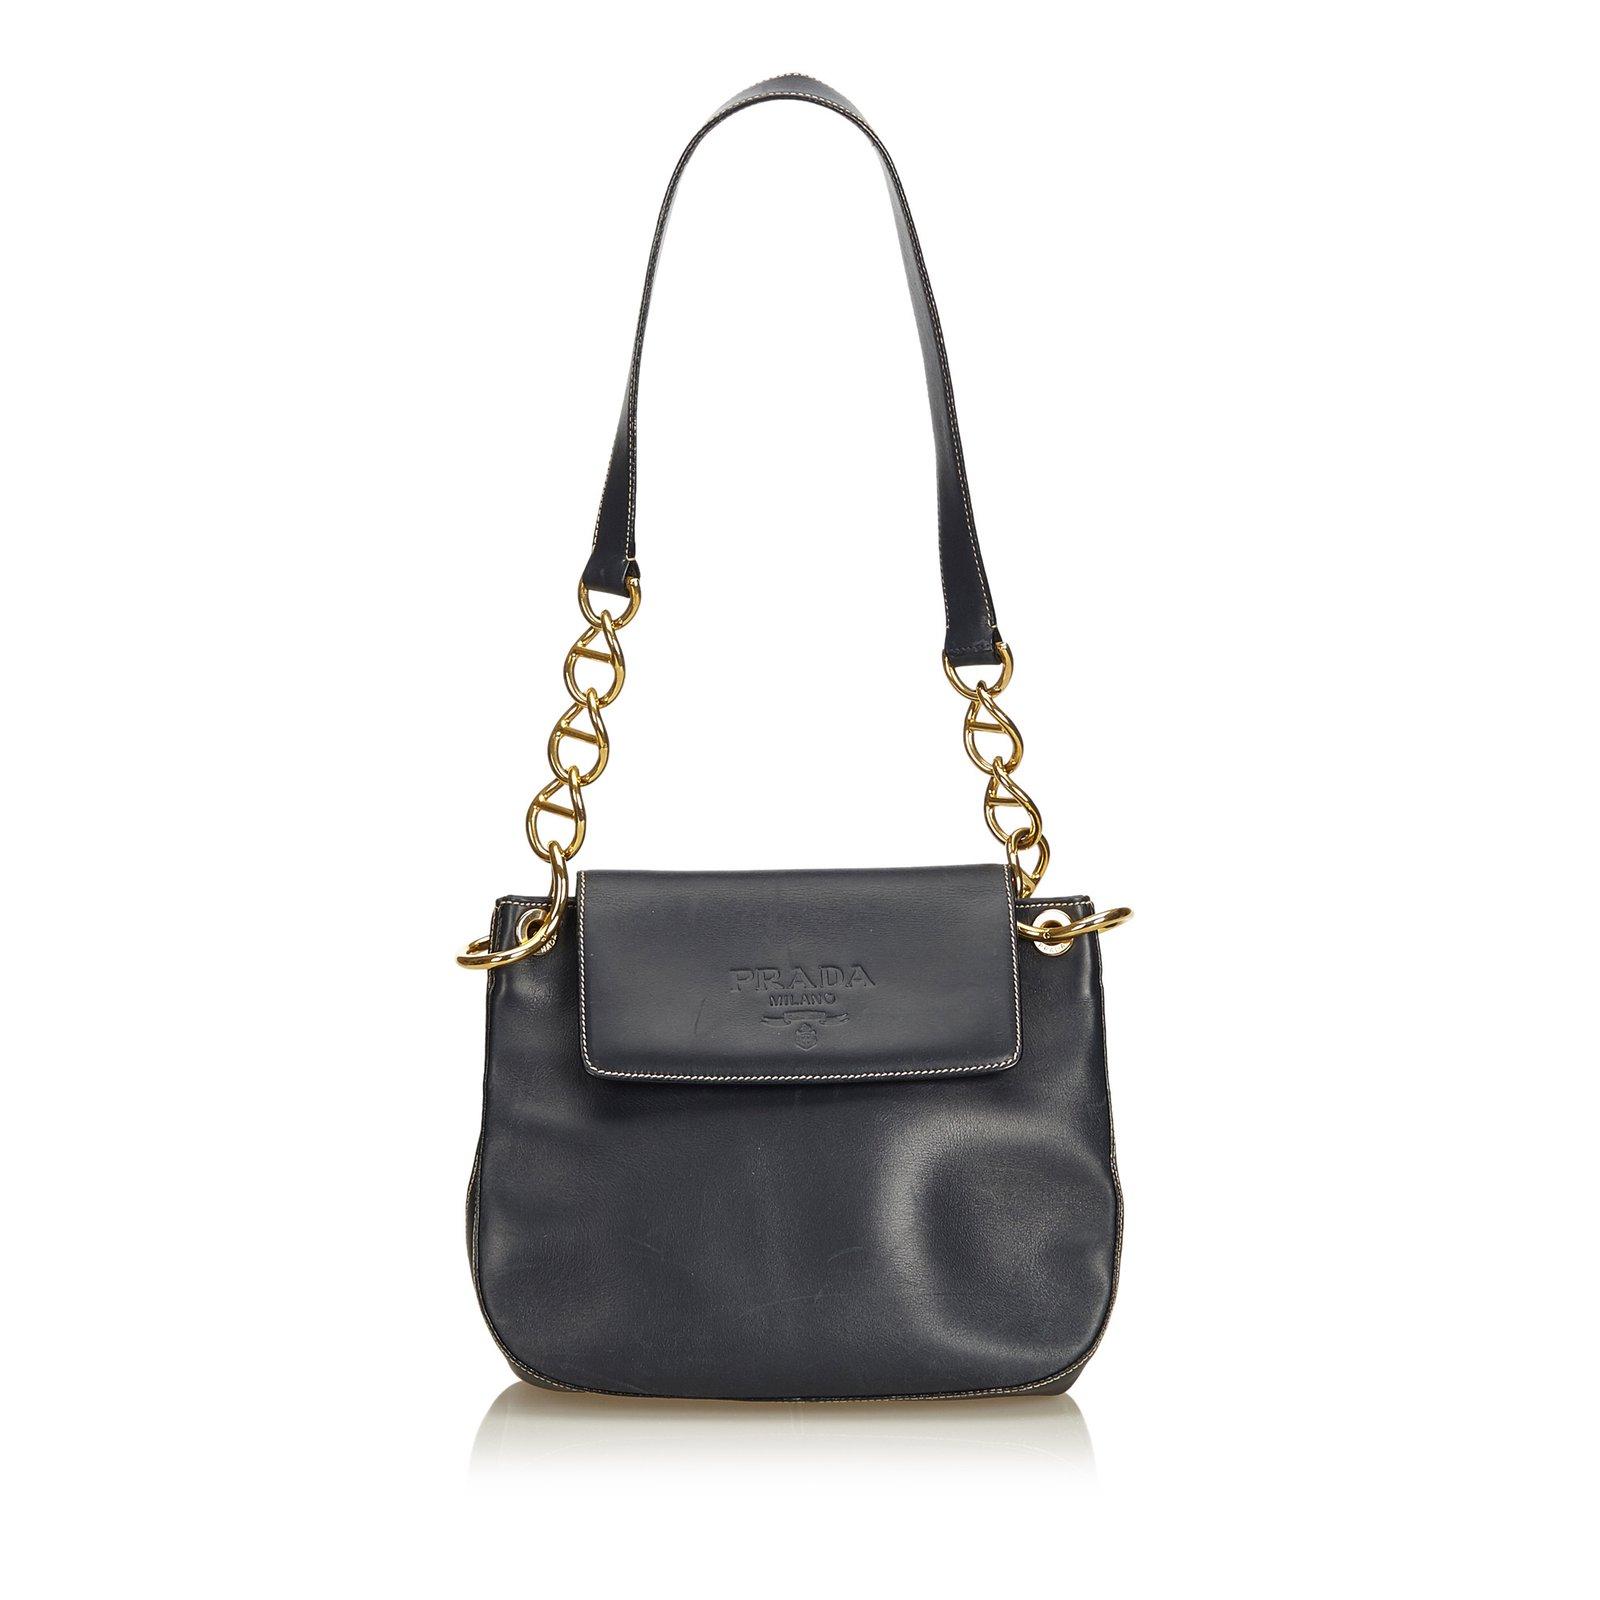 b4cbfa8e41ef Prada Calf Leather Chain Shoulder Bag Handbags Leather ,Silver,Metal,Pony-style